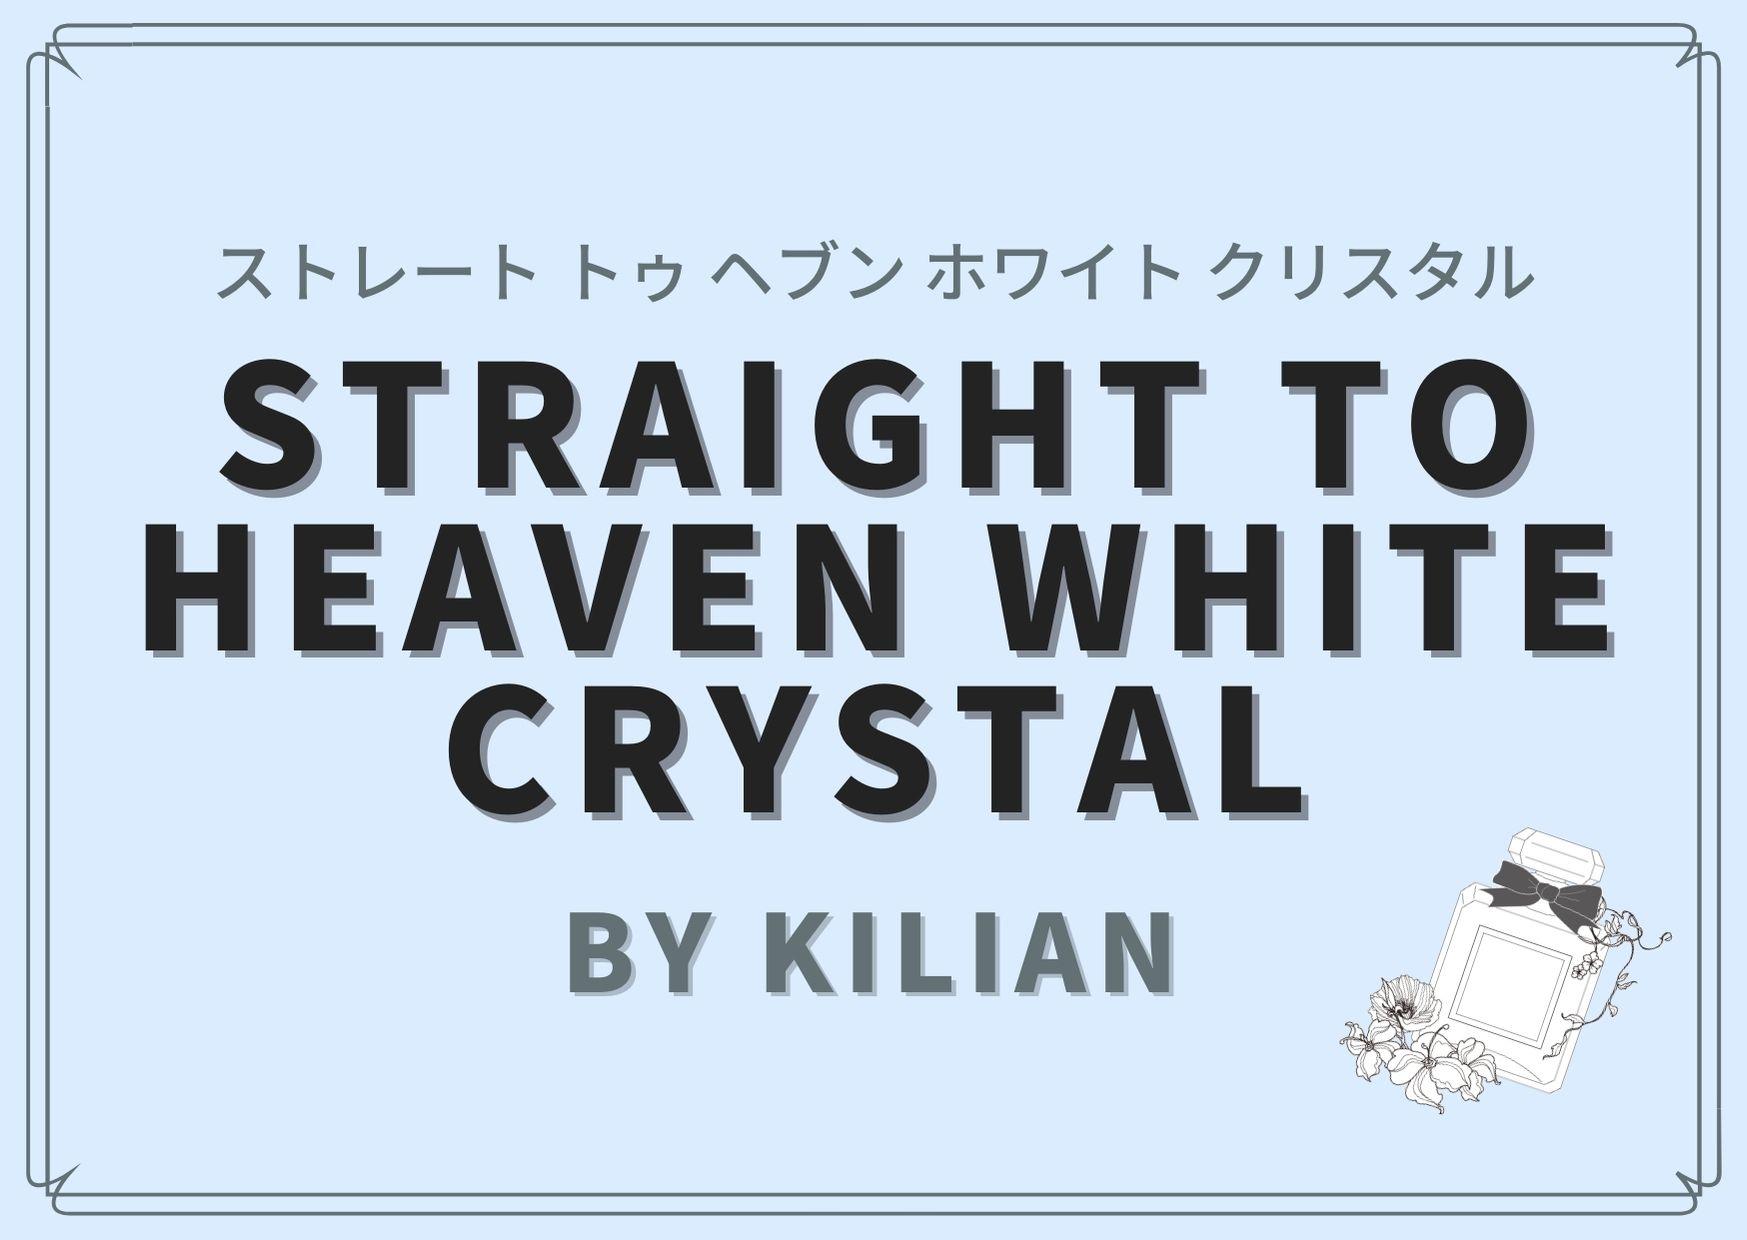 Straight to Heaven White Crystal(ストレート トゥ ヘブン ホワイト クリスタル)/ By Kilian(バイ キリアン)